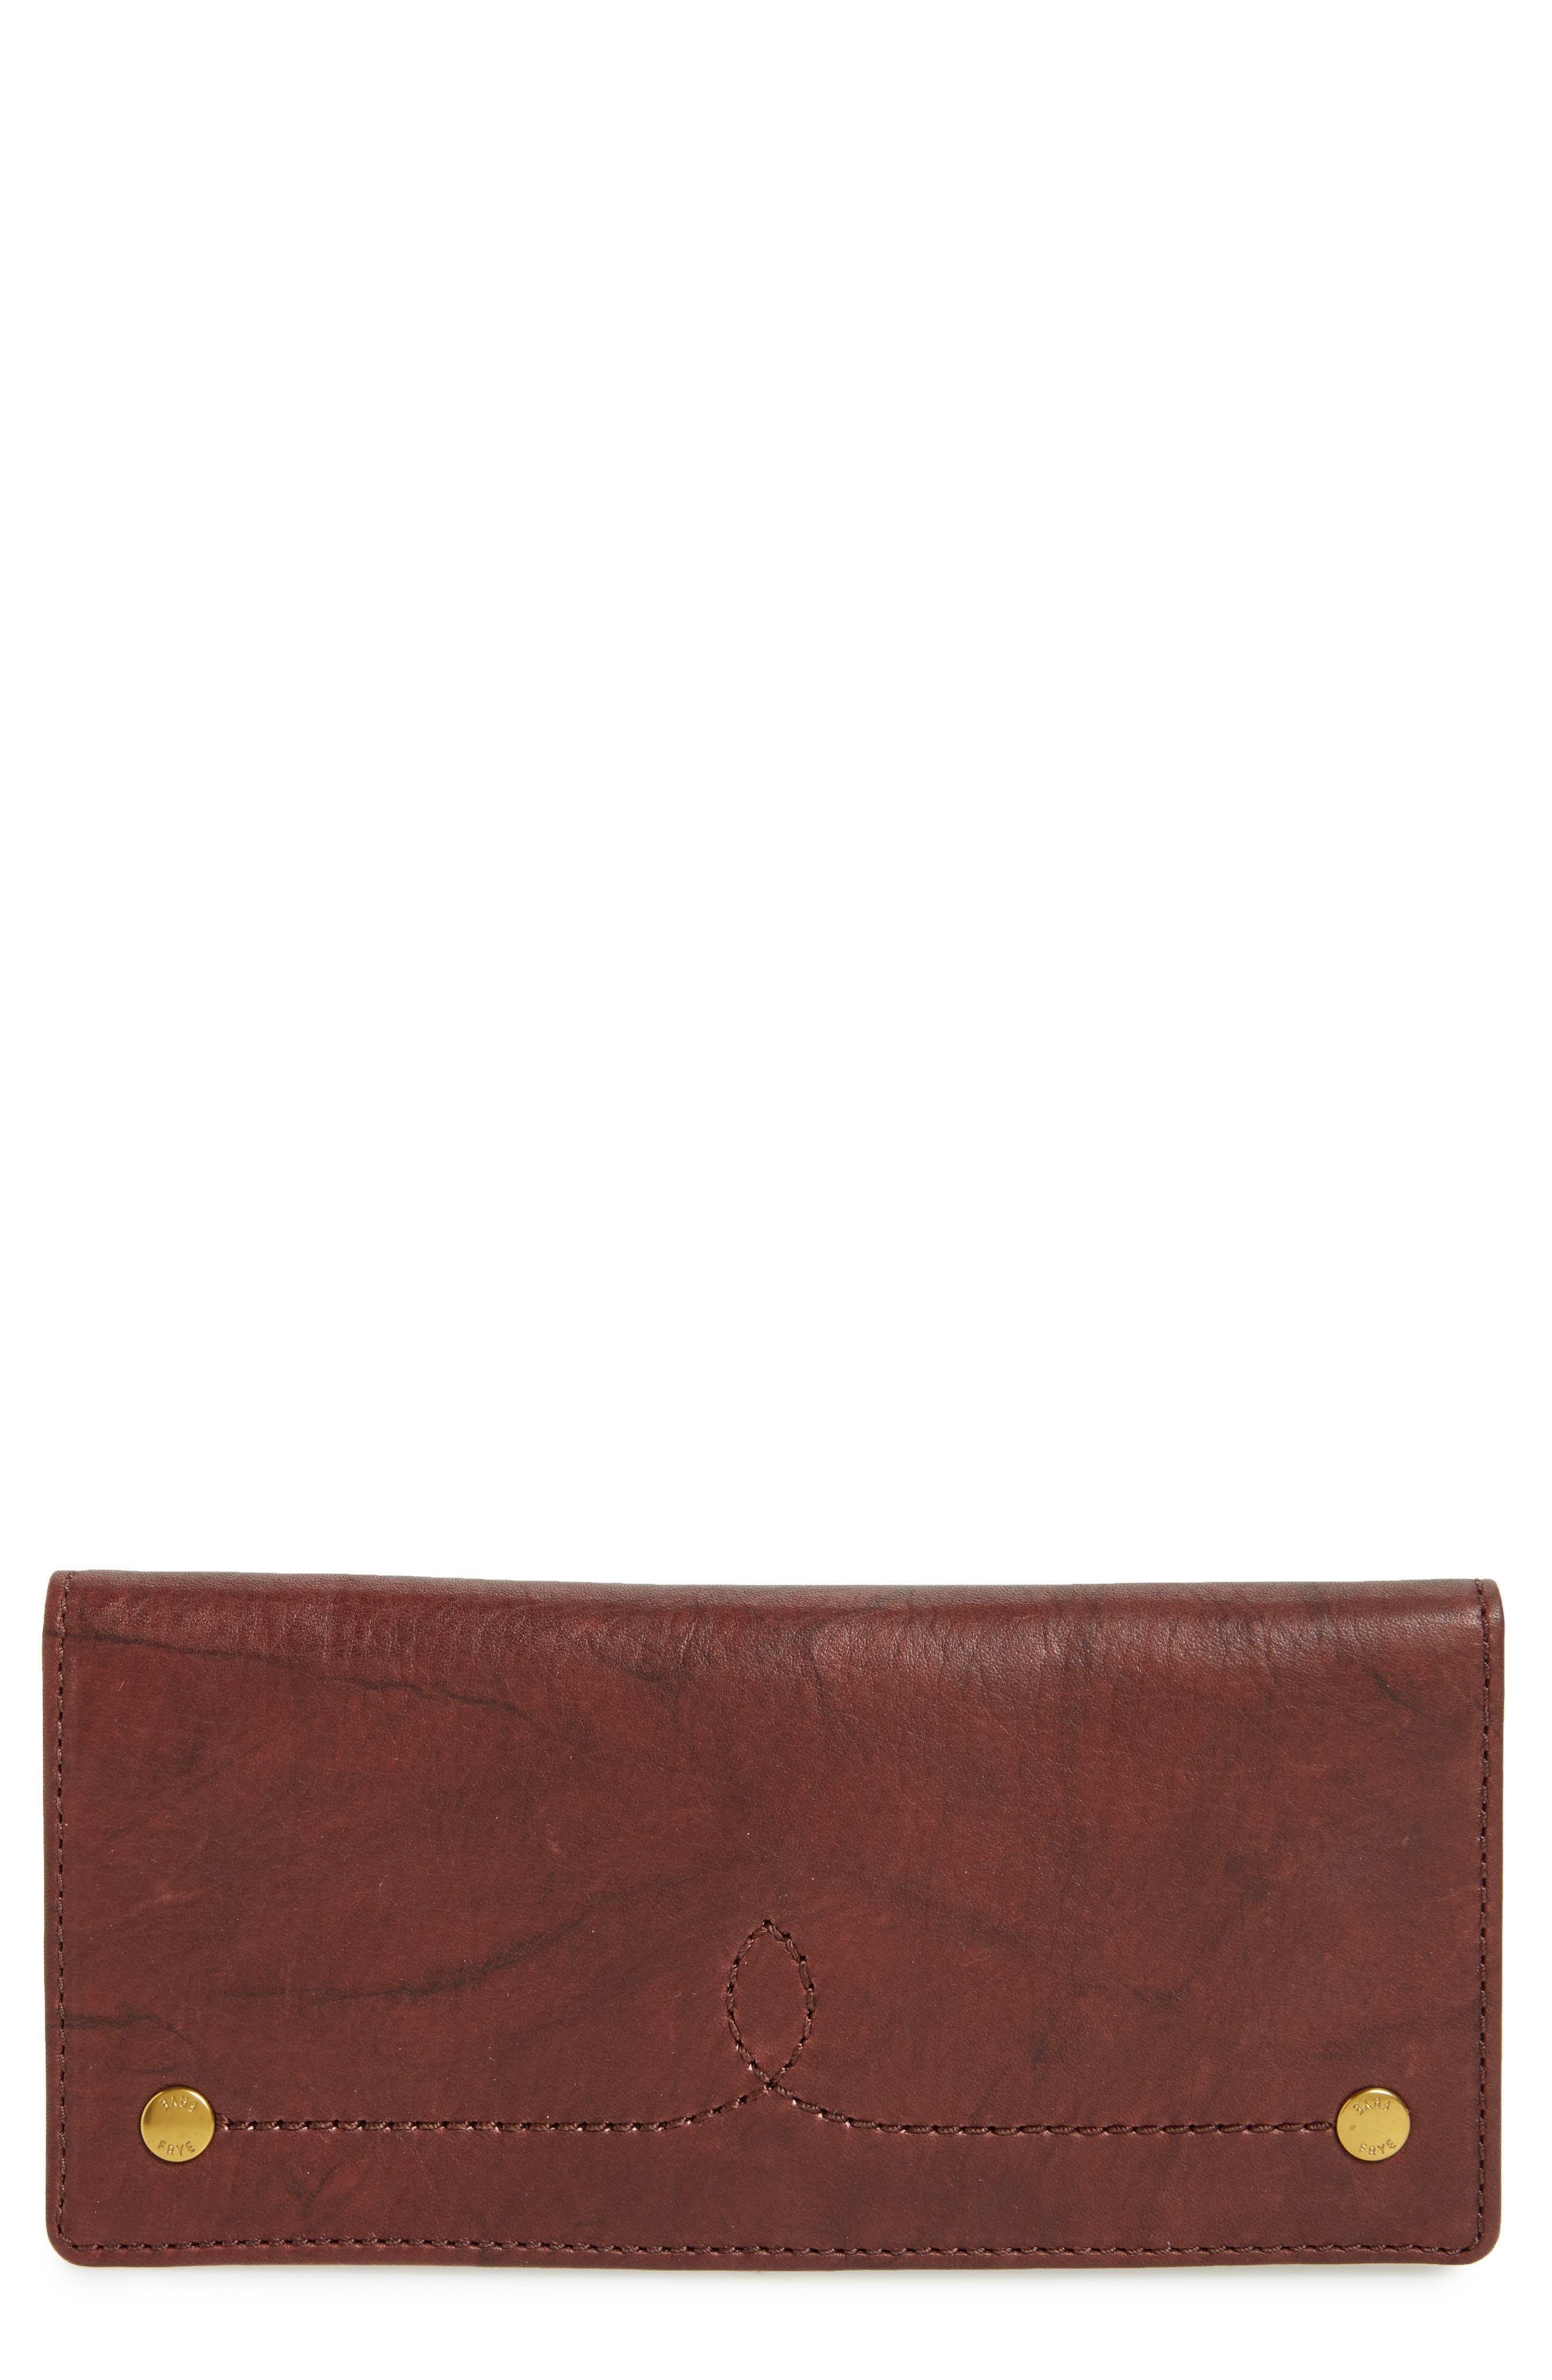 Alternate Image 1 Selected - Frye Campus Rivet Slim Leather Wallet